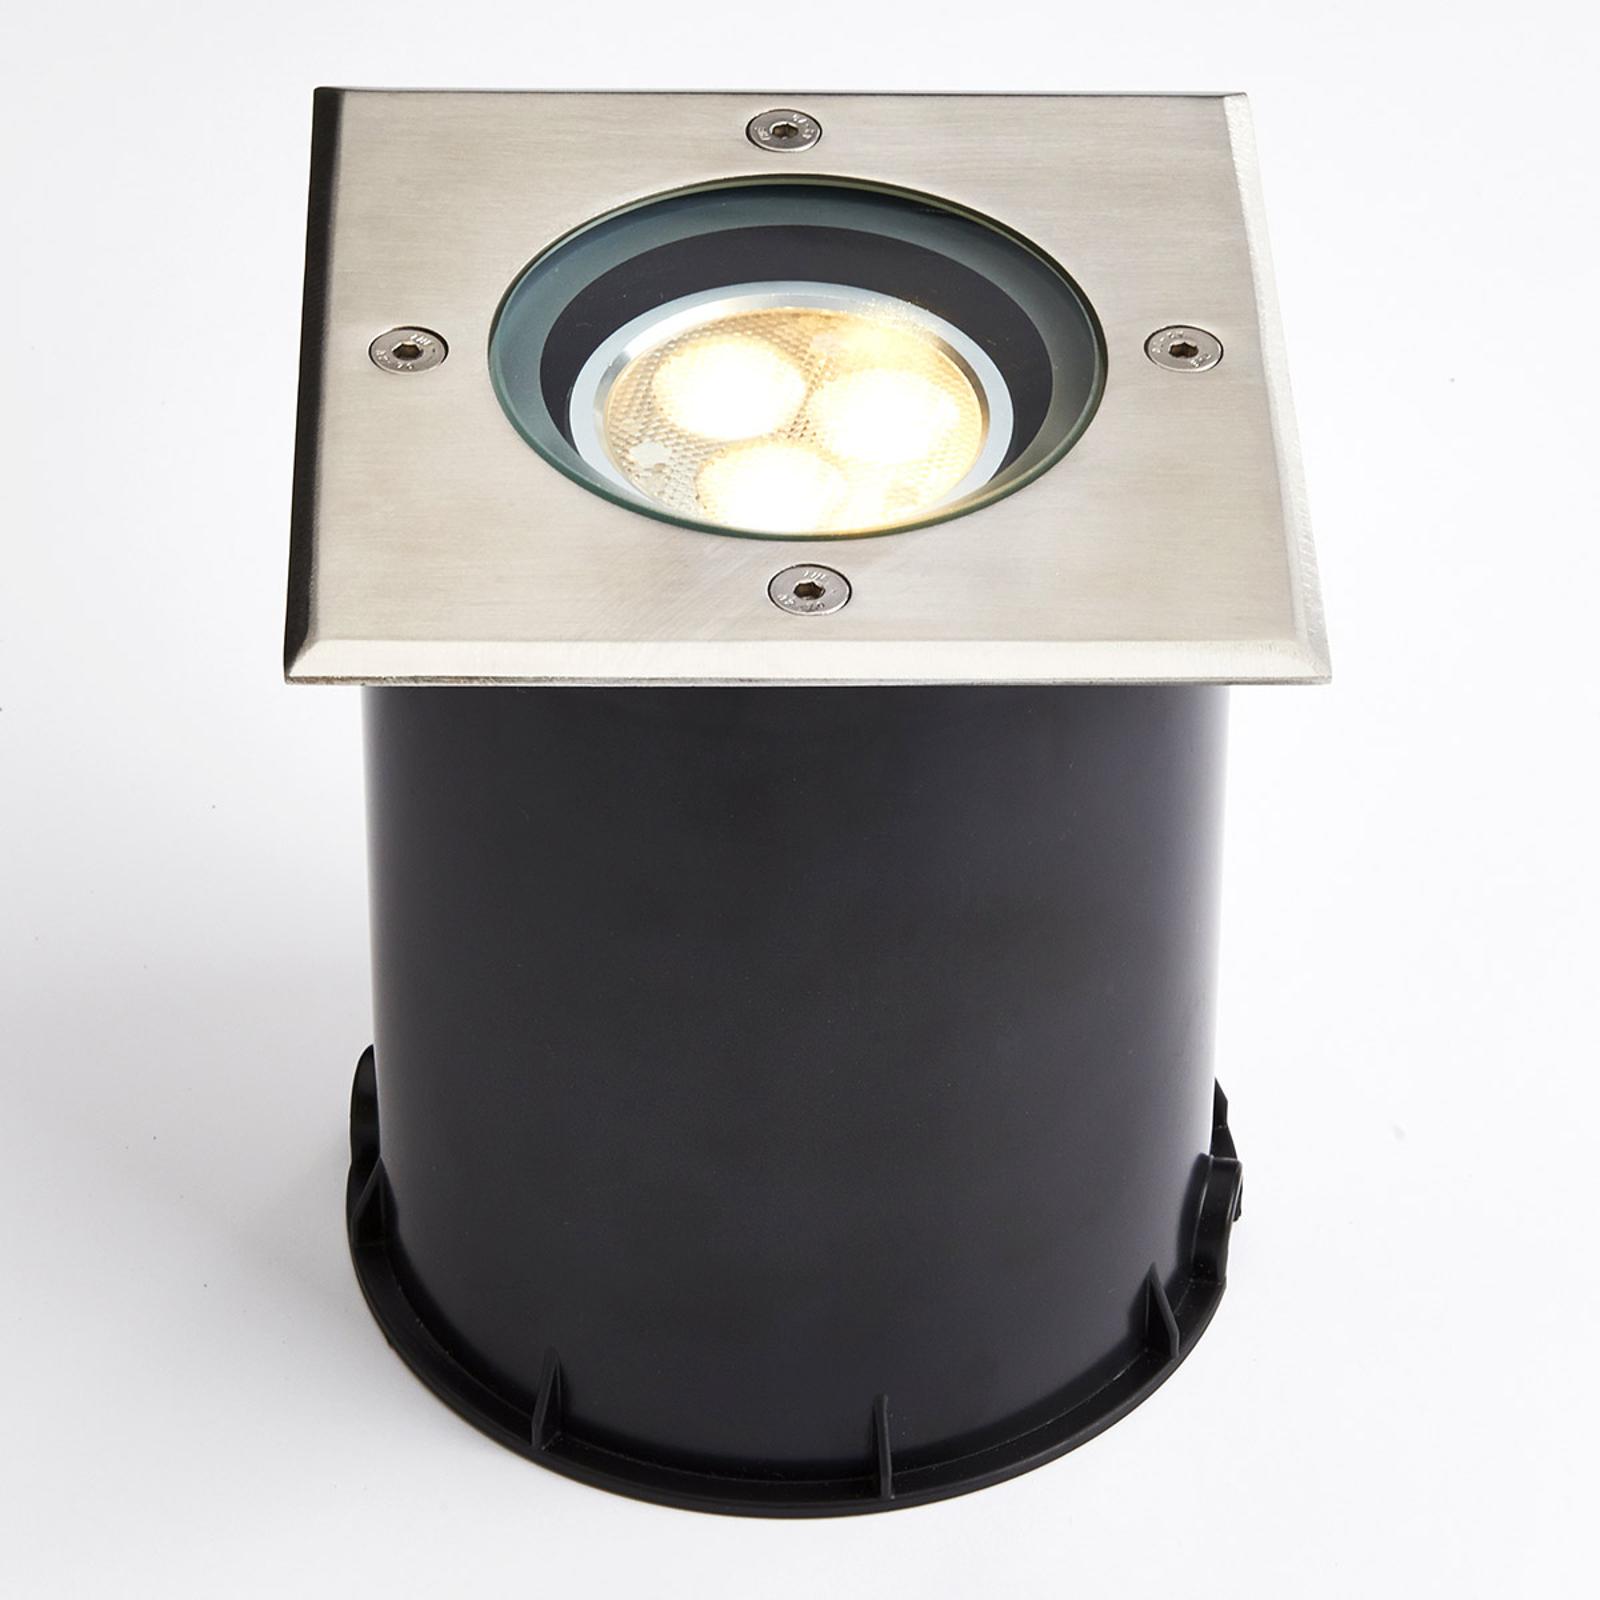 Lampada pavimento, LED, oscill., IP67